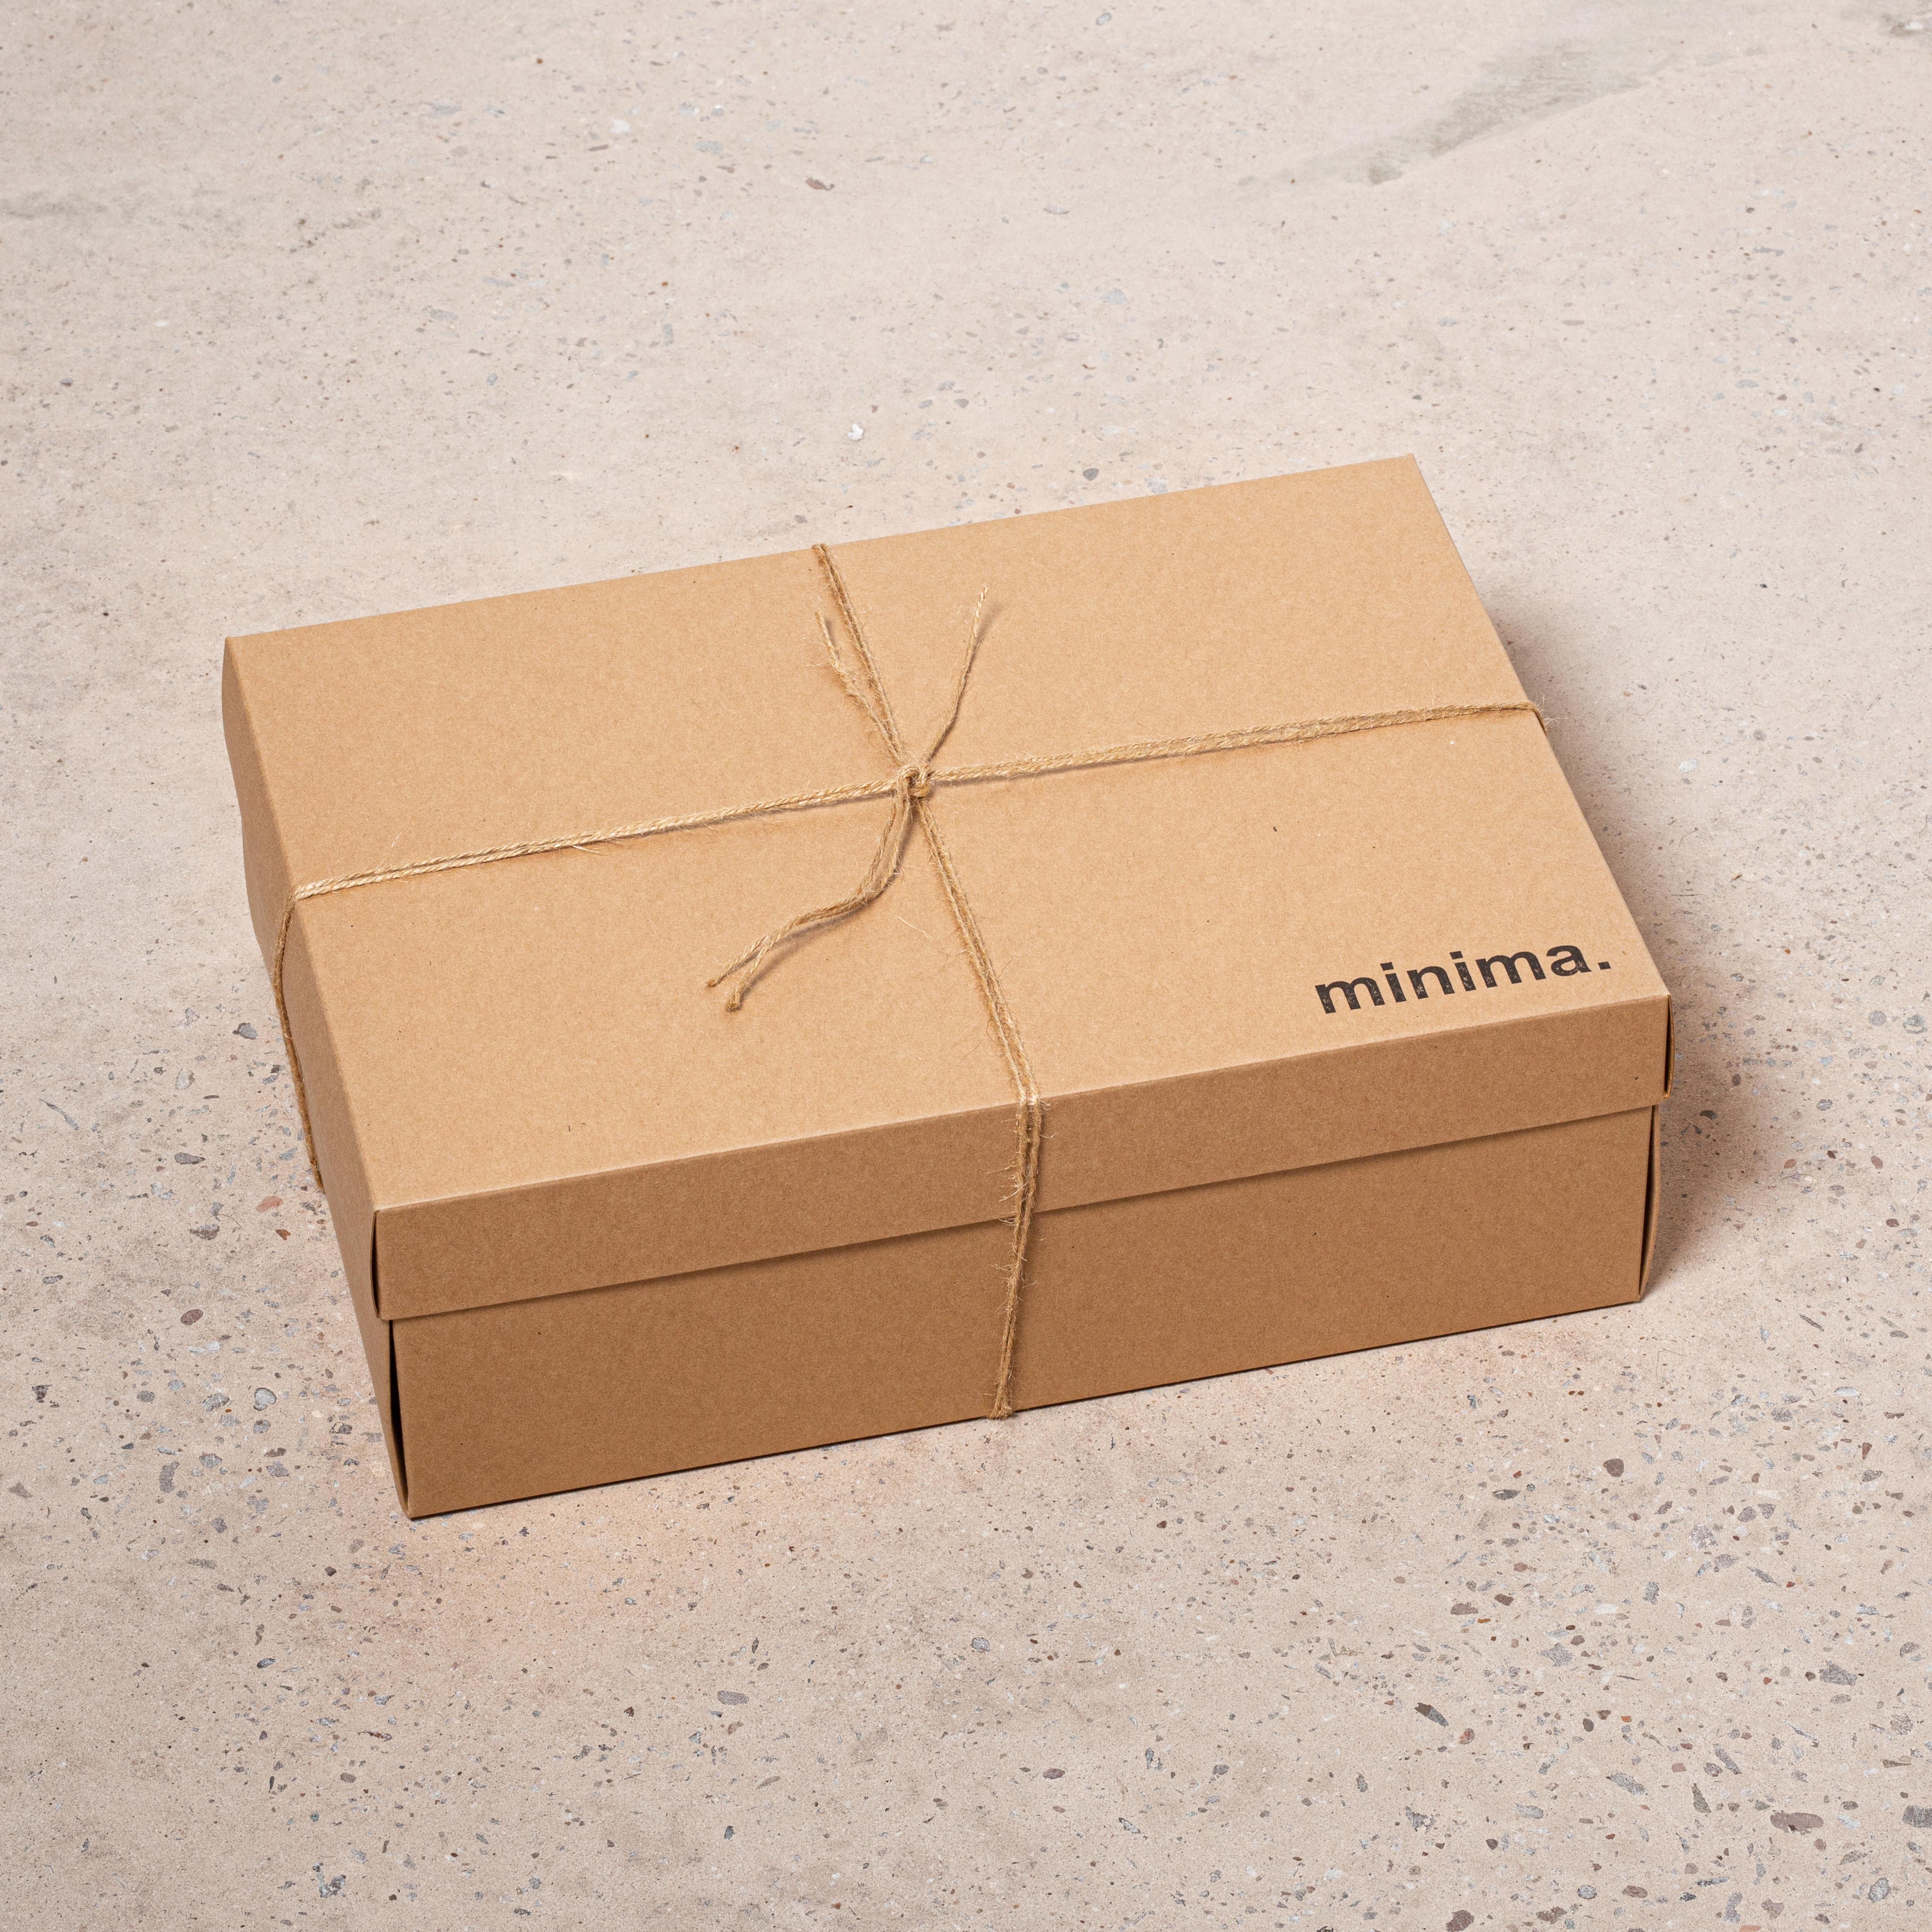 Minima Hampers Box Contemporary Designer Homeware